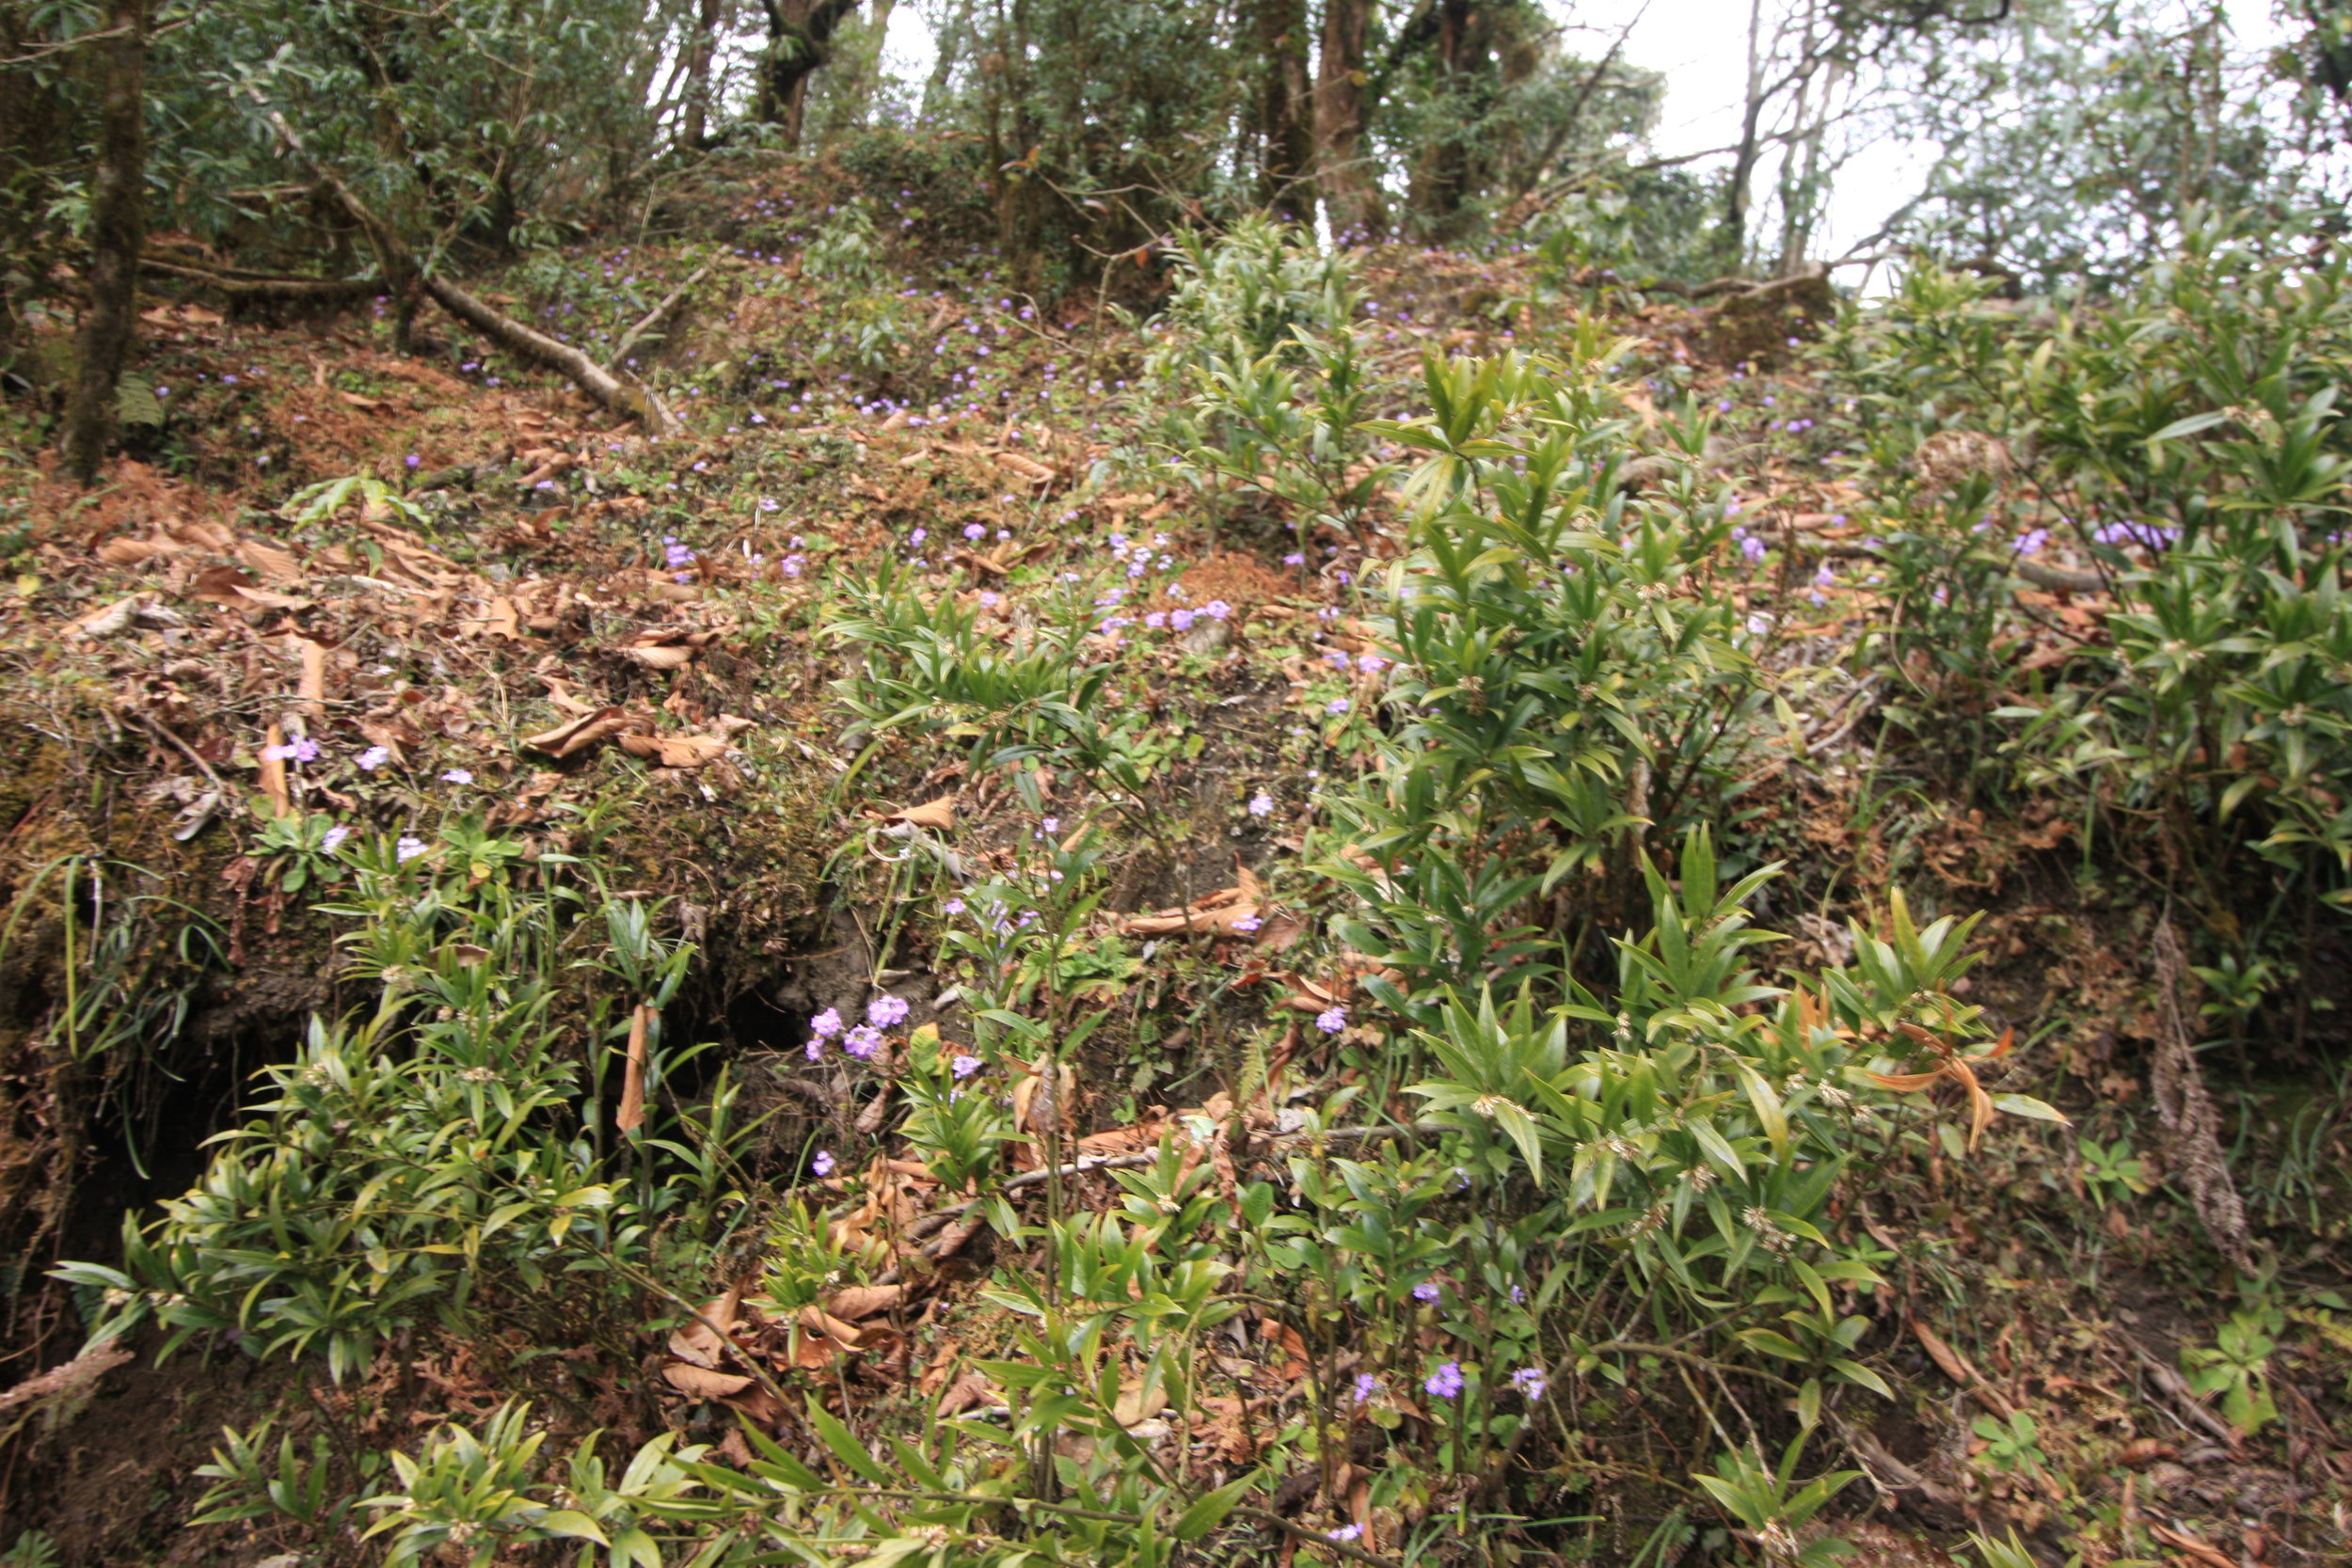 Sarcococca sp. and Primula denticulata